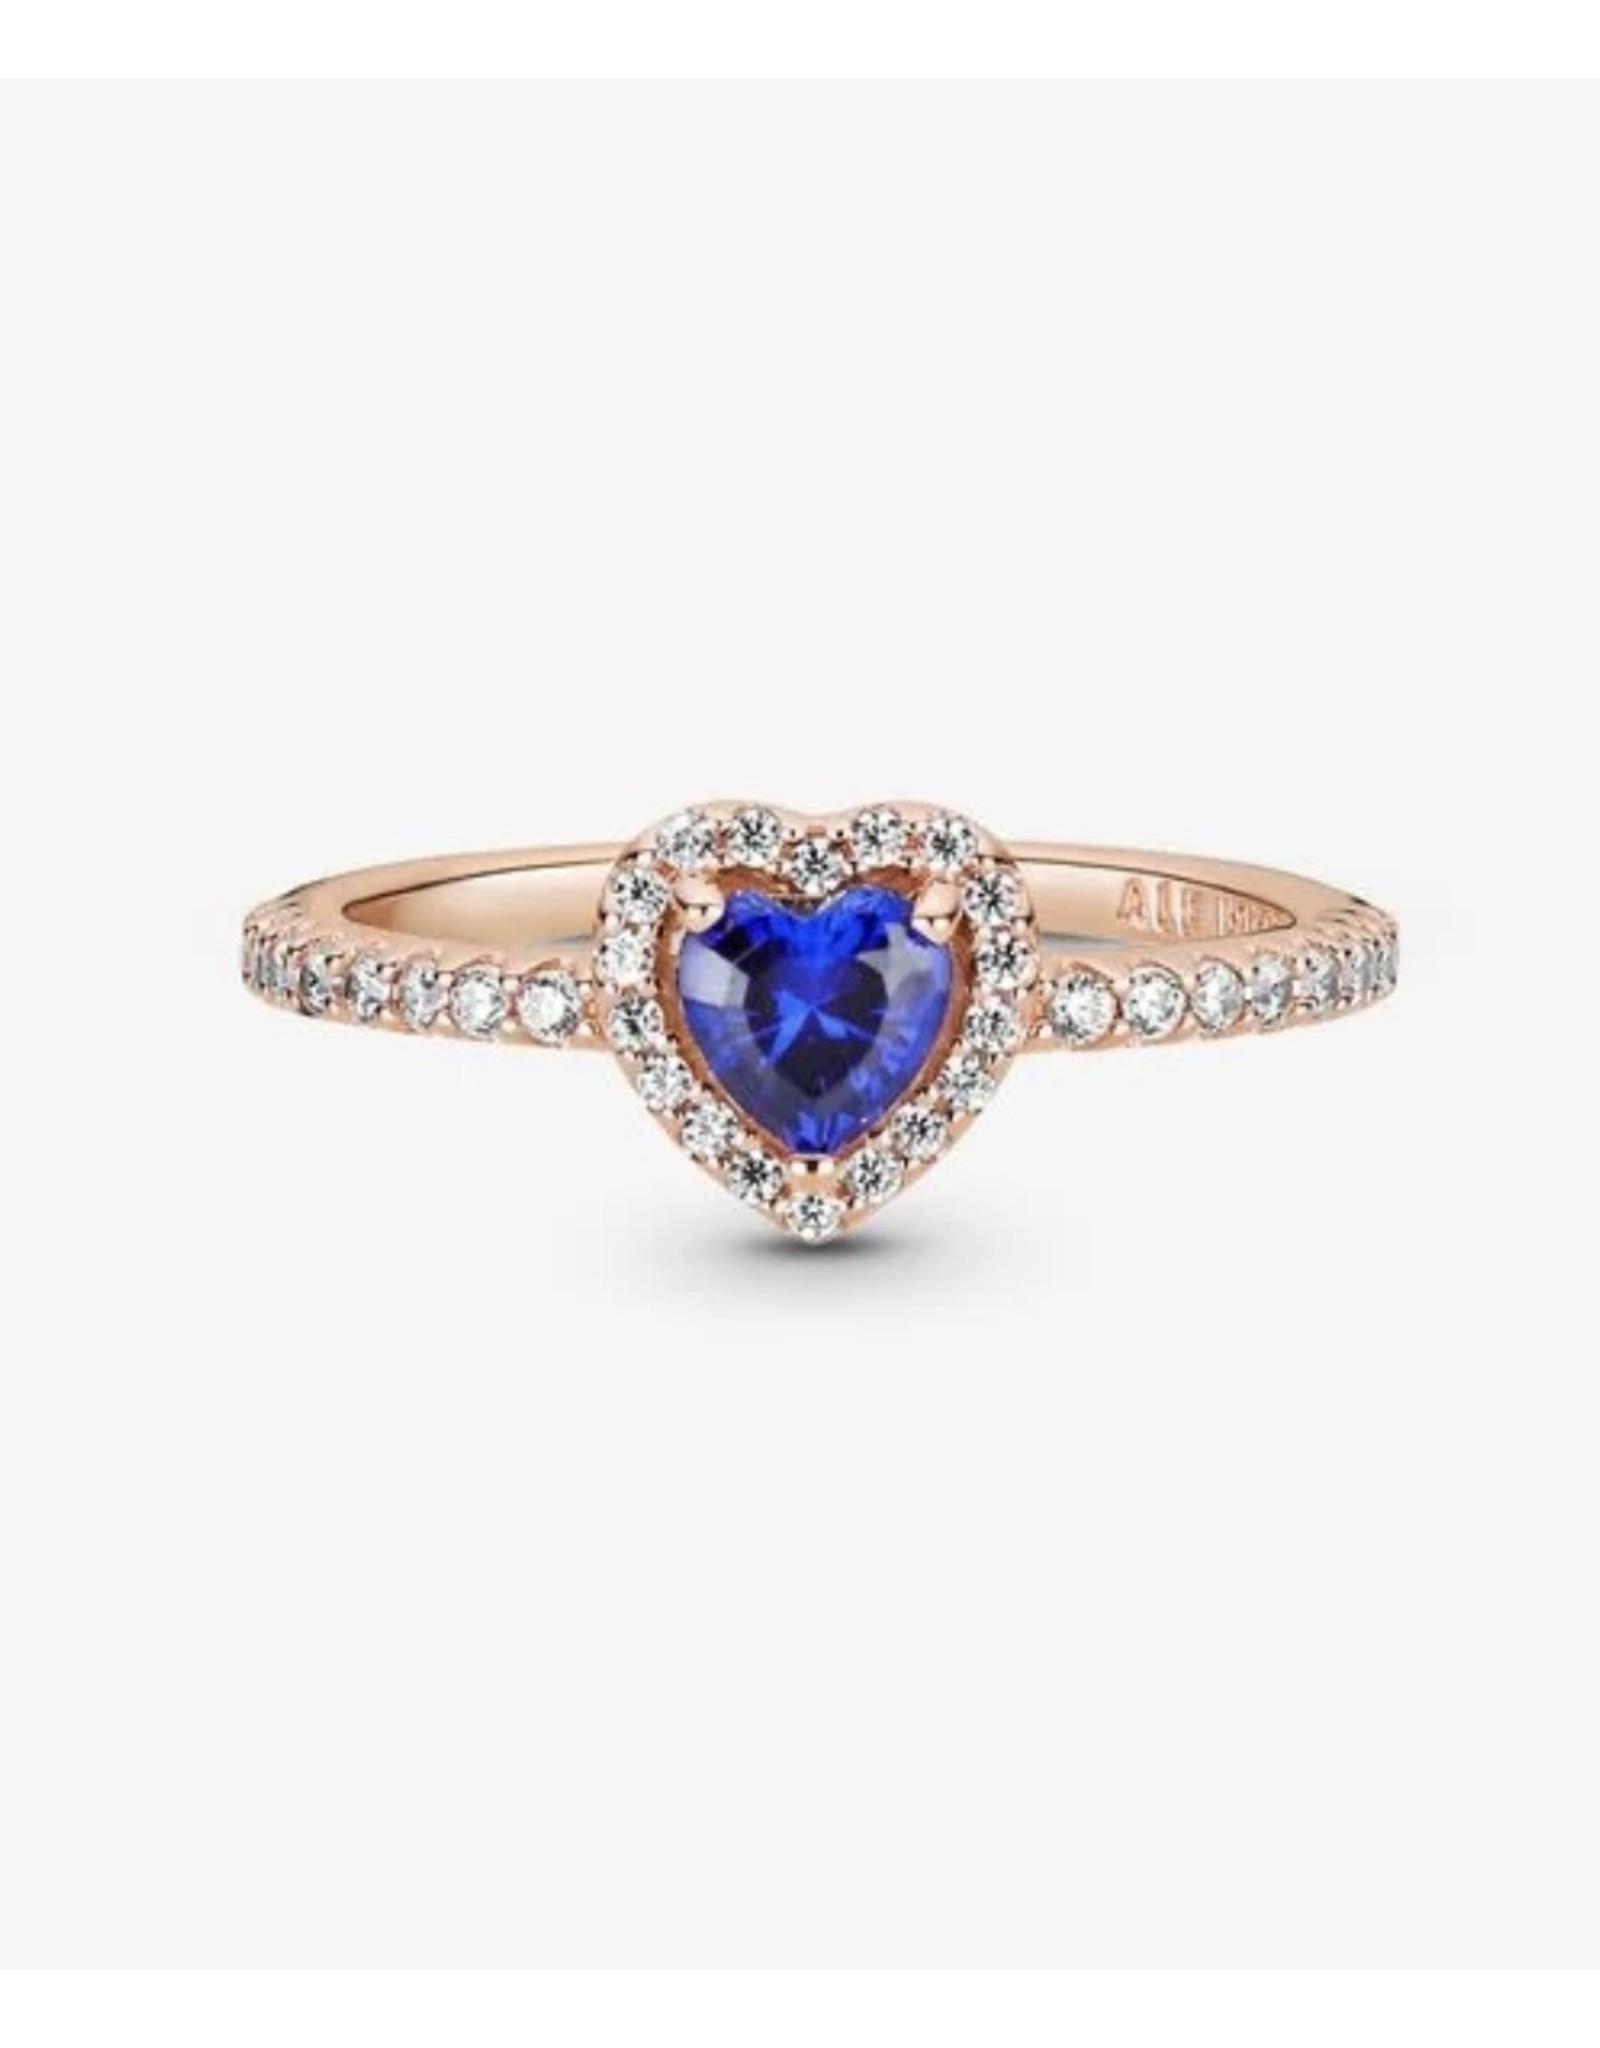 Pandora Pandora Ring,188421C01, Sparkling Blue Elevated Heart, Clear CZ, Rose Gold